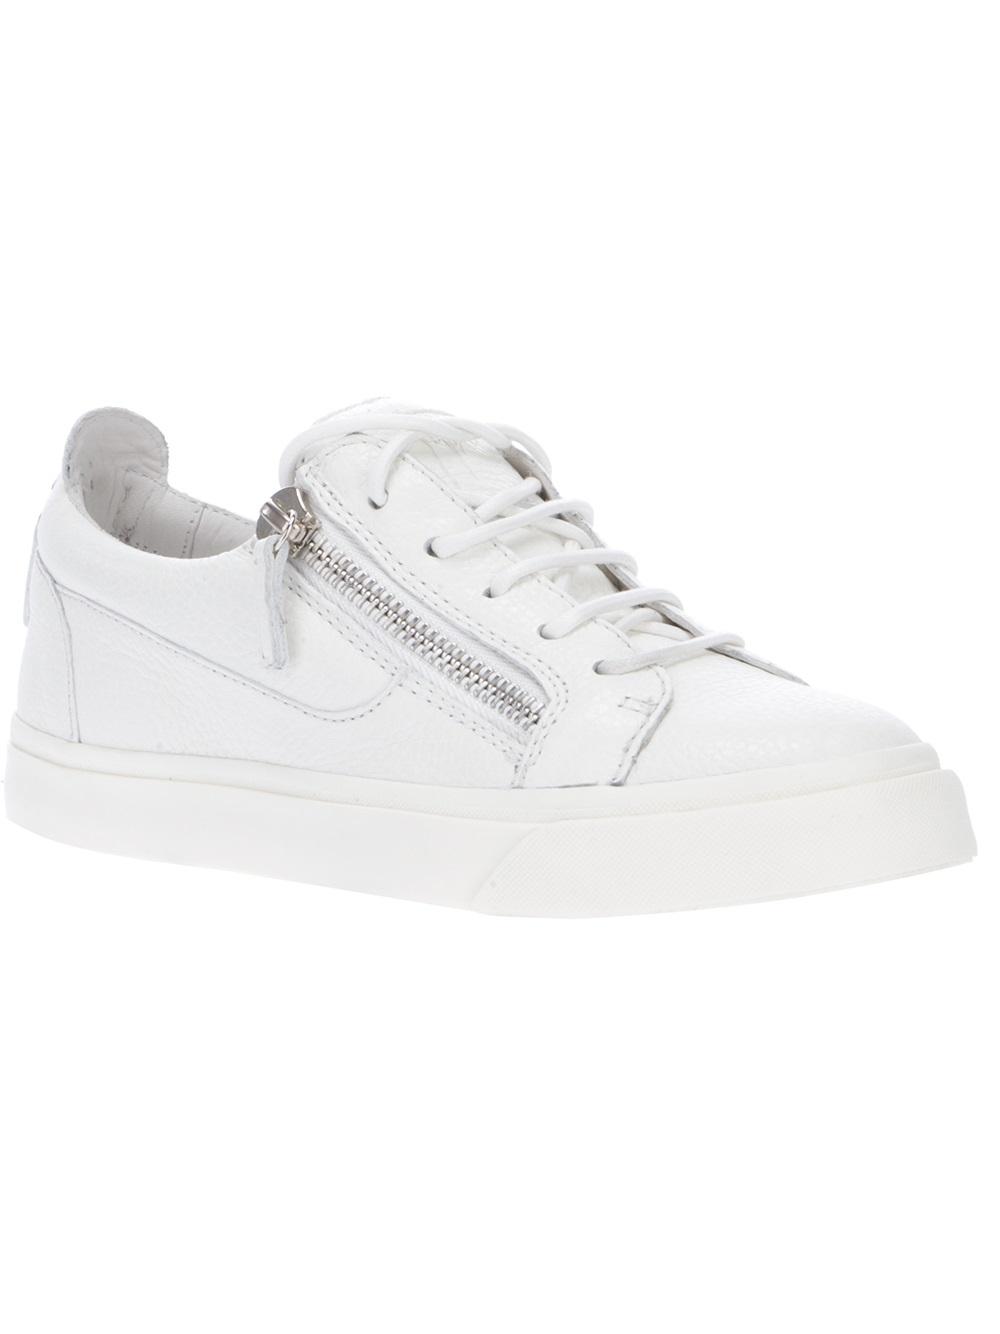 Lyst - Giuseppe Zanotti Zip Detailed Sneakers in White bb016d06920a